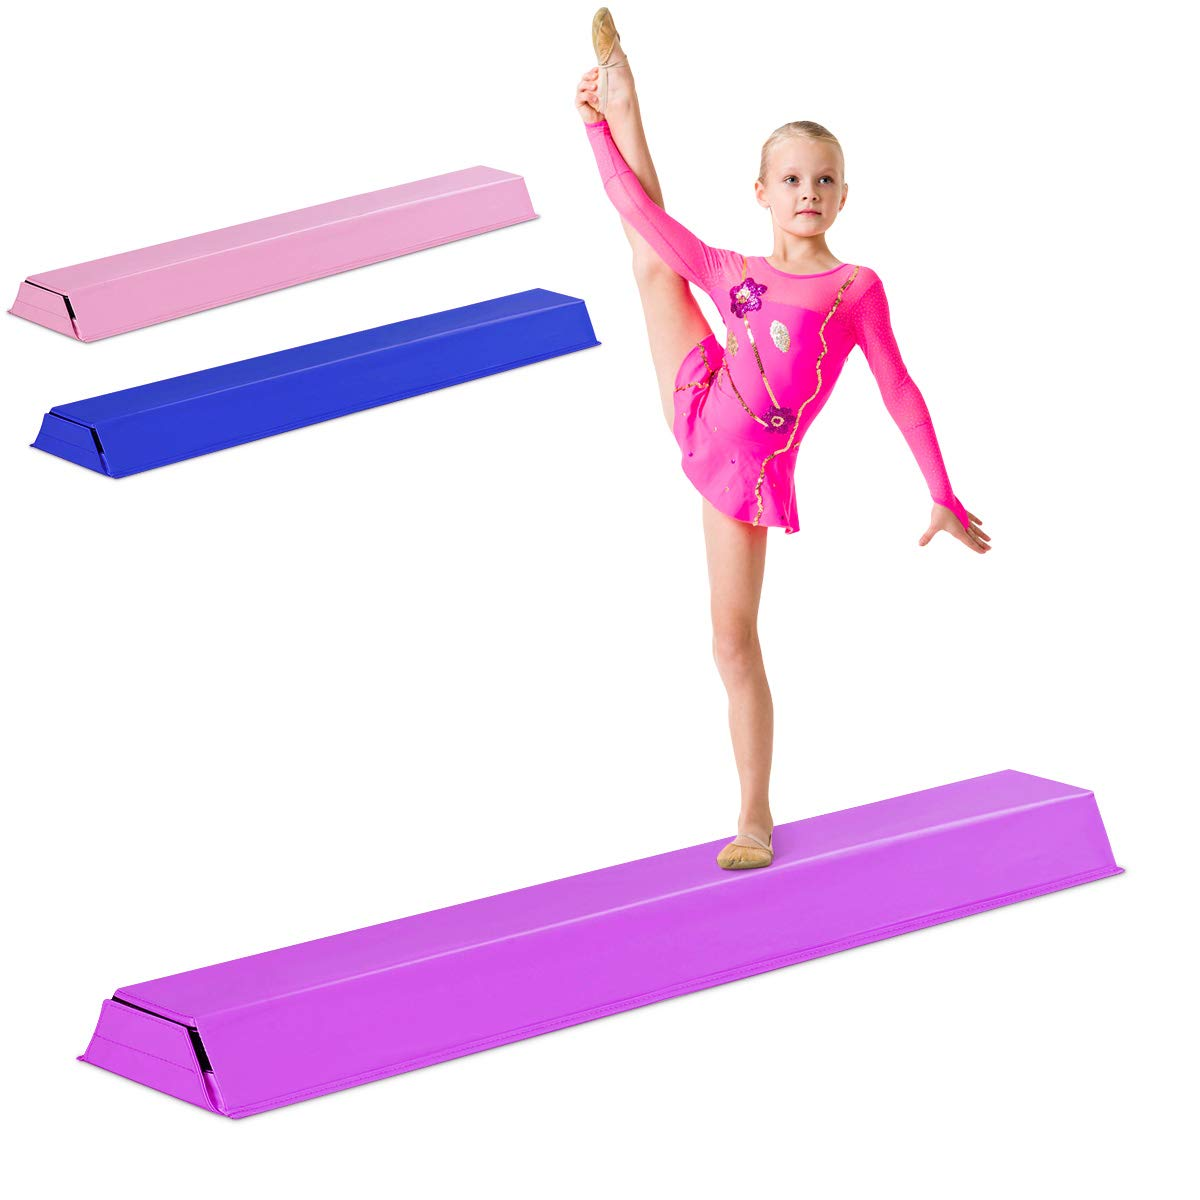 Giantex 4 Ft Floor Balance Beam Gymnastics Equipment for Beginners & Professional Gymnasts Skill Performance Training Easy Storage